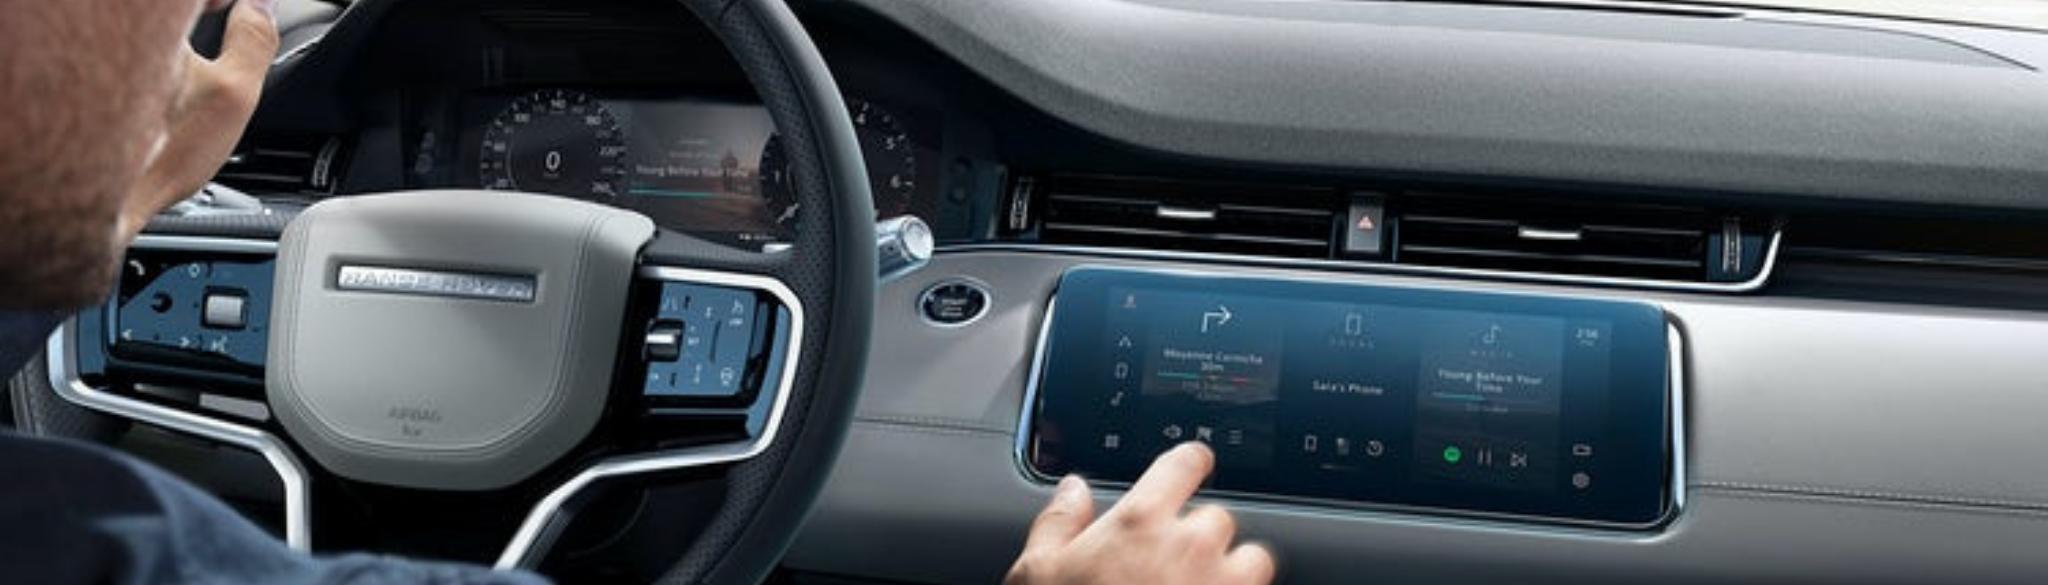 Range Rover Evoque 2021 Interior